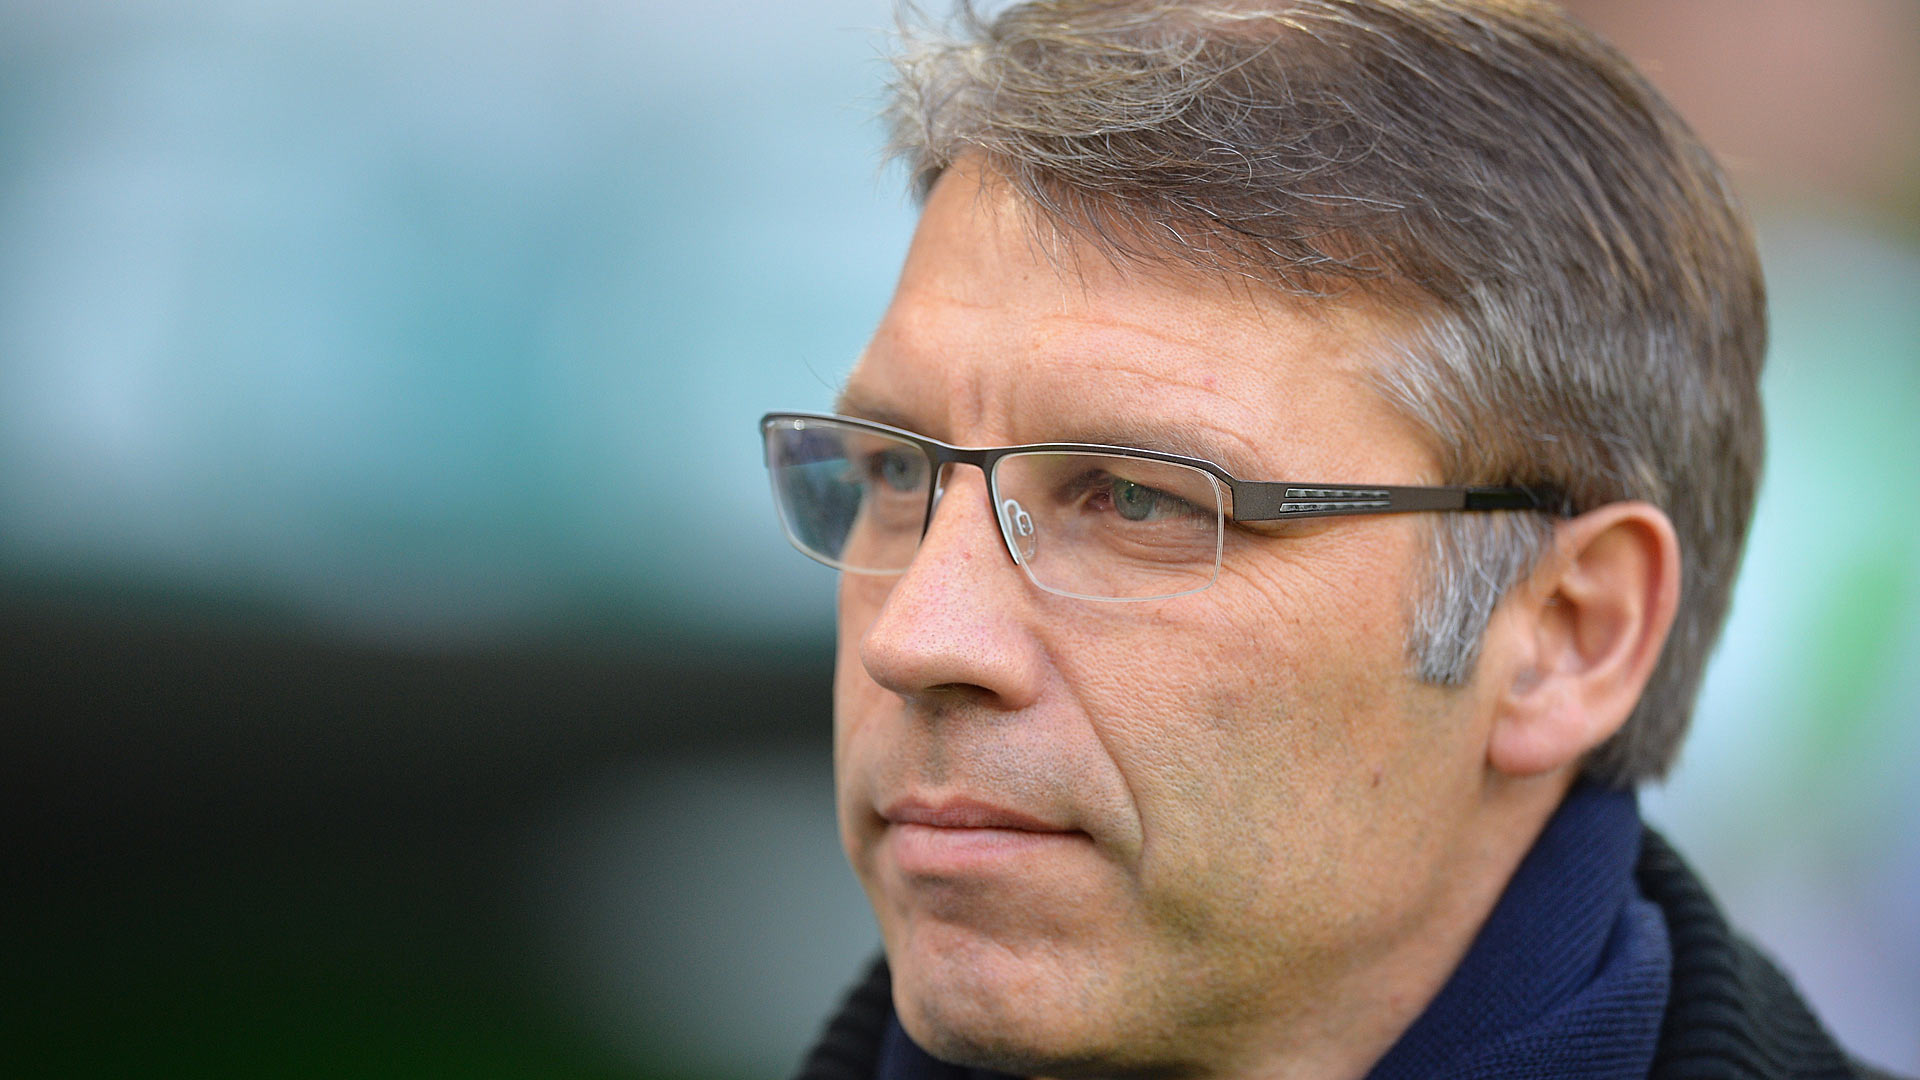 Leitung der Knappenschmiede: Schalke holt wohl Ex-HSV-Manager Peter Knäbel